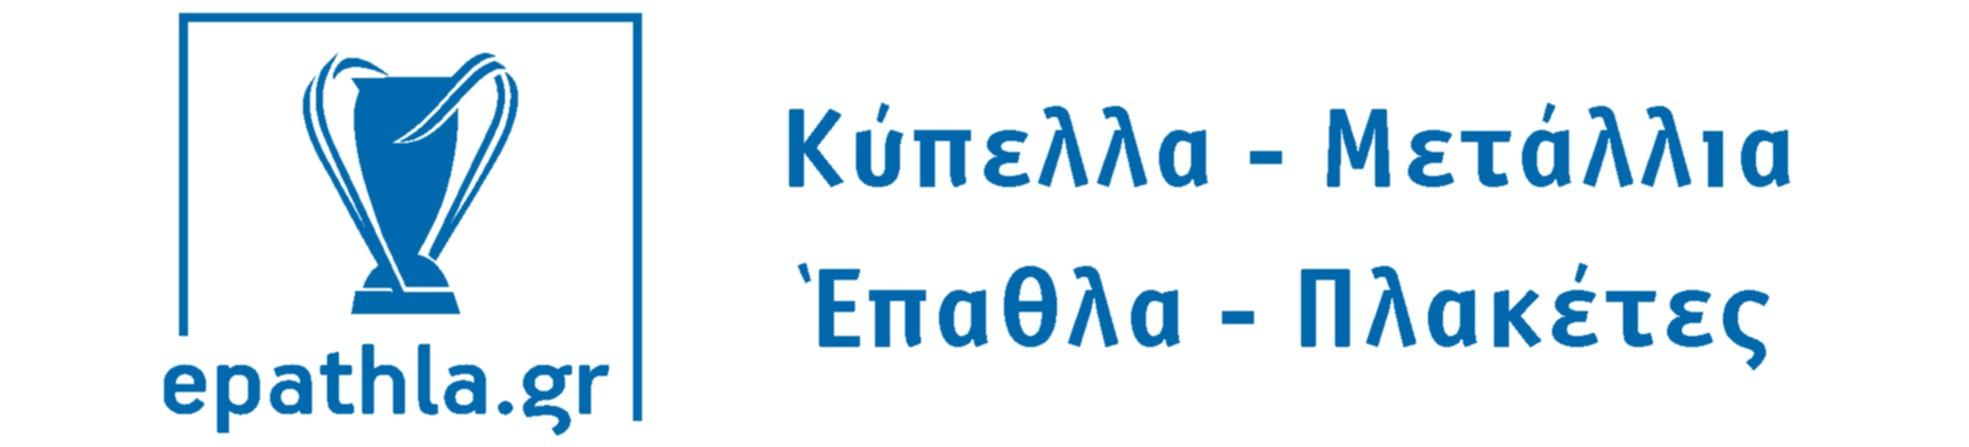 epathla.gr